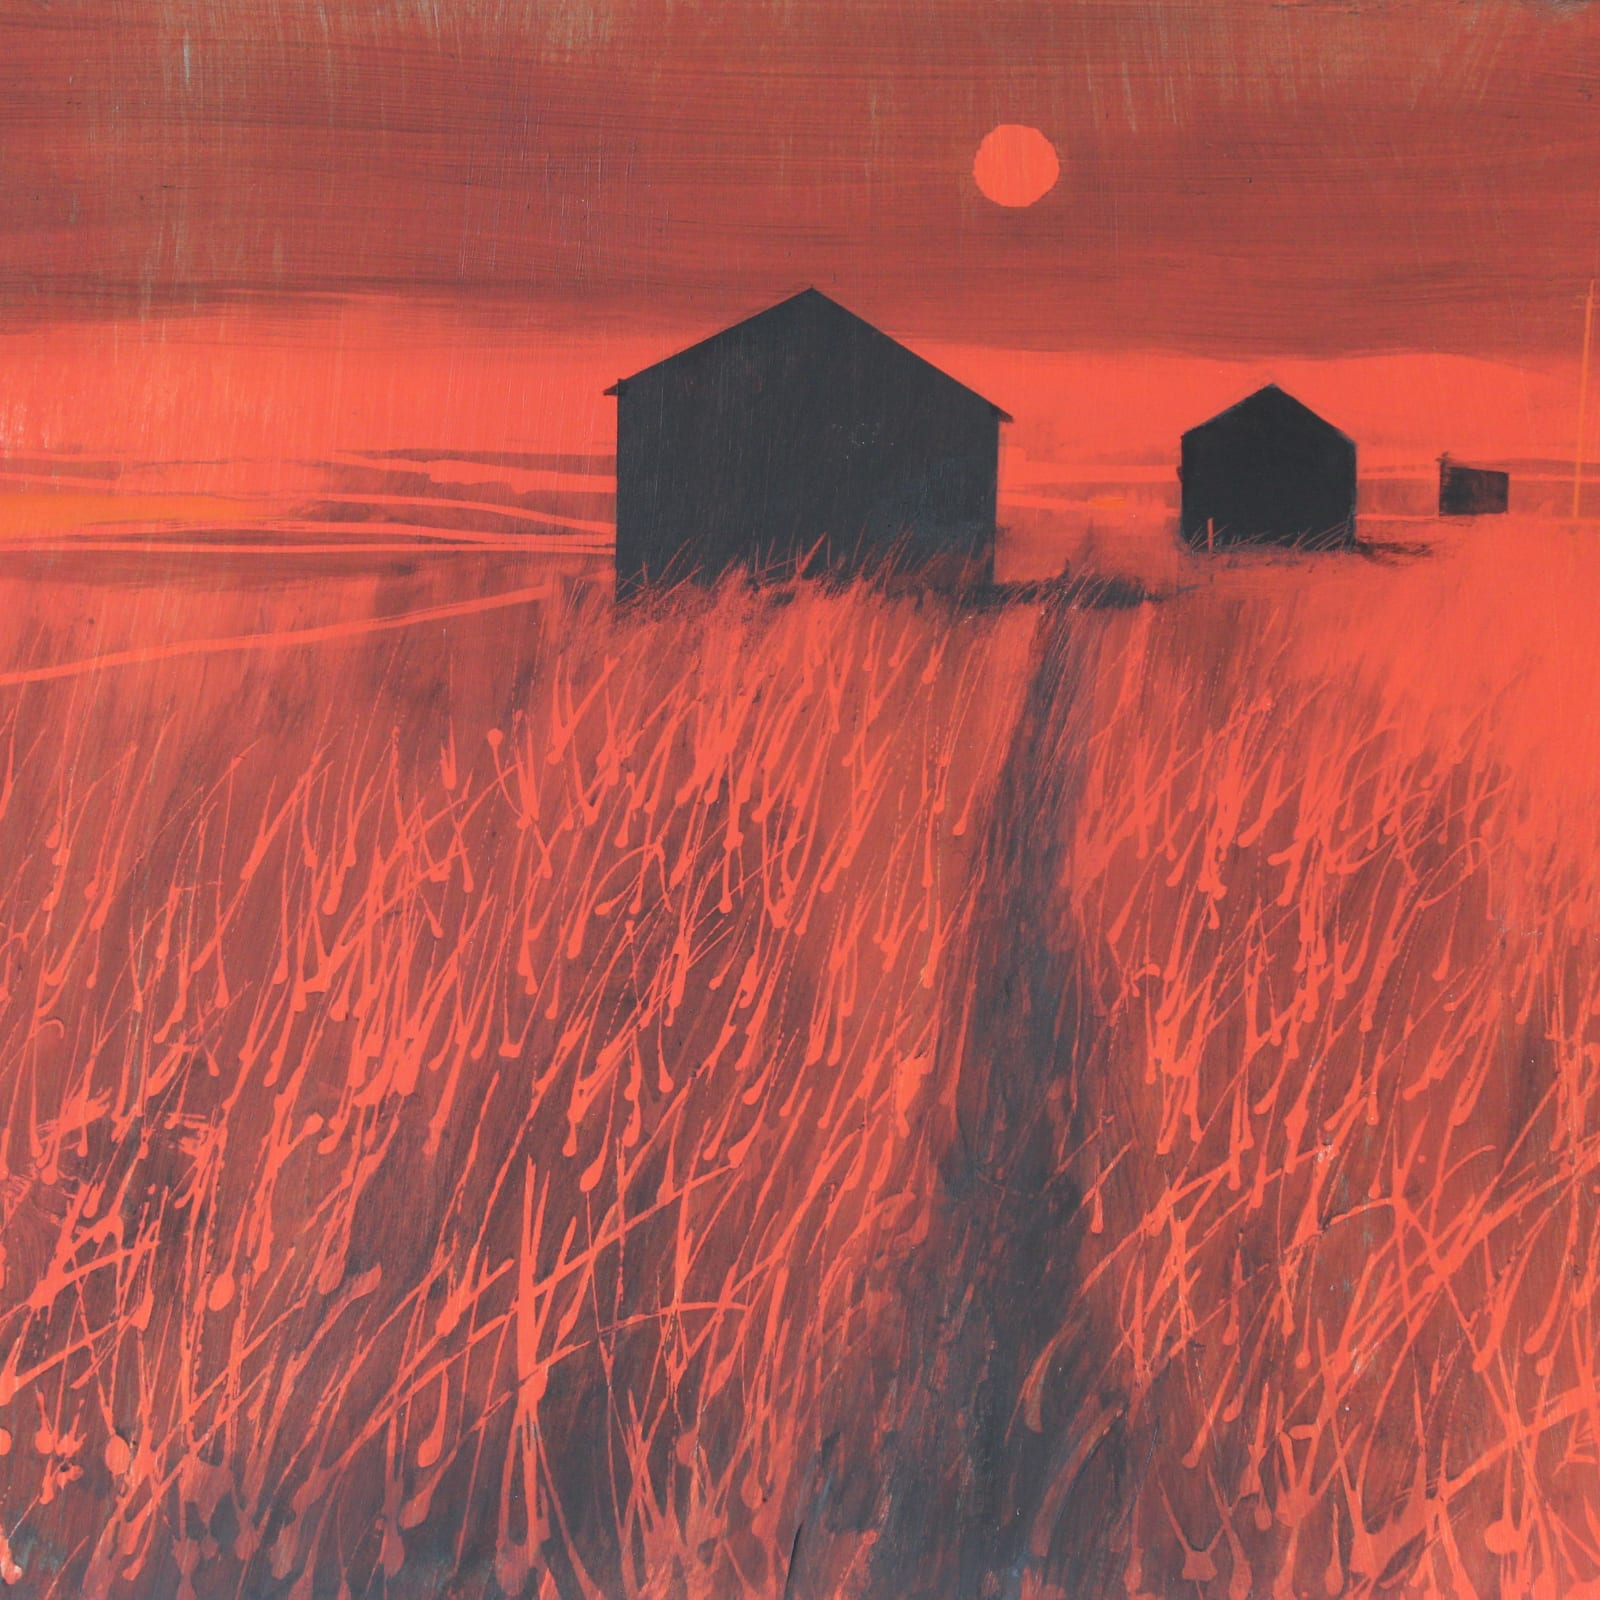 Alasdair Lindsay, Fishermen's Huts and Estuary, Sunset, 2019